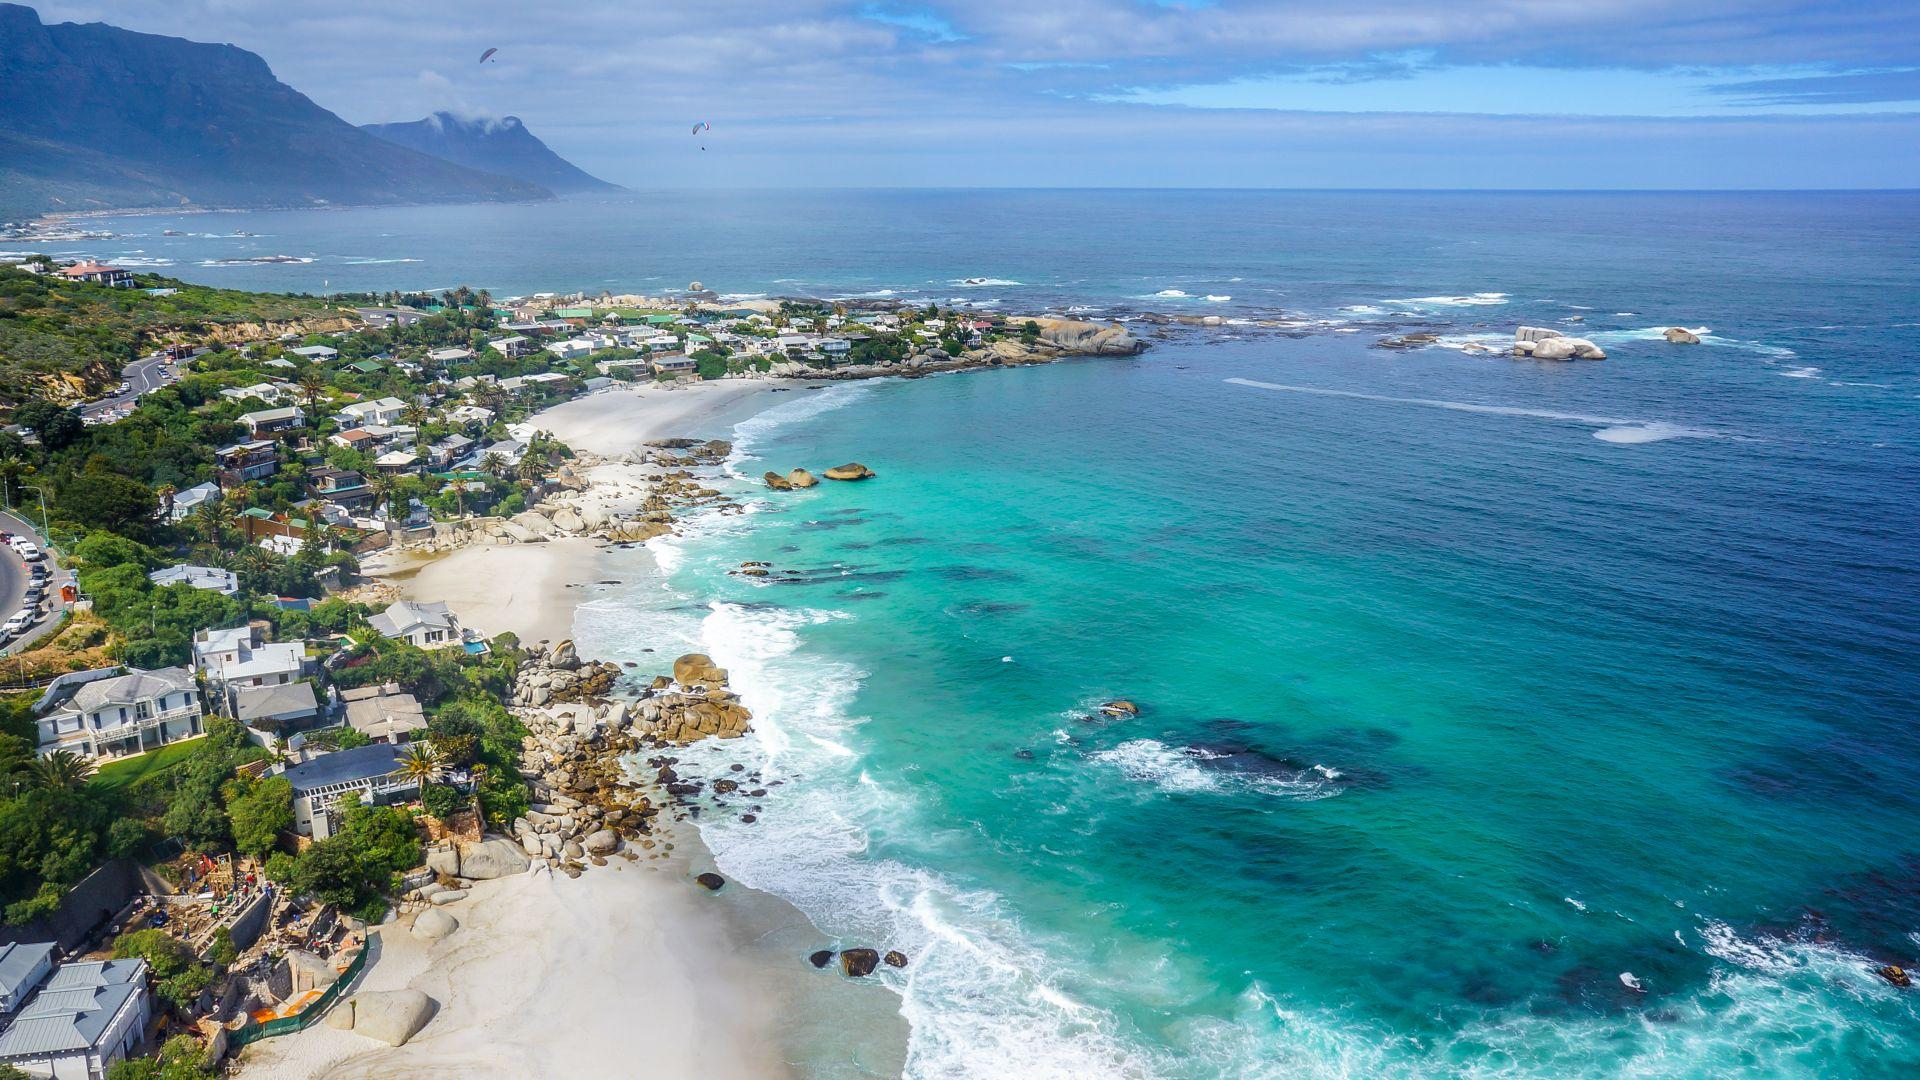 Wallpaper Cape Town Clifton Beachs Ocean 4k Nature 16629